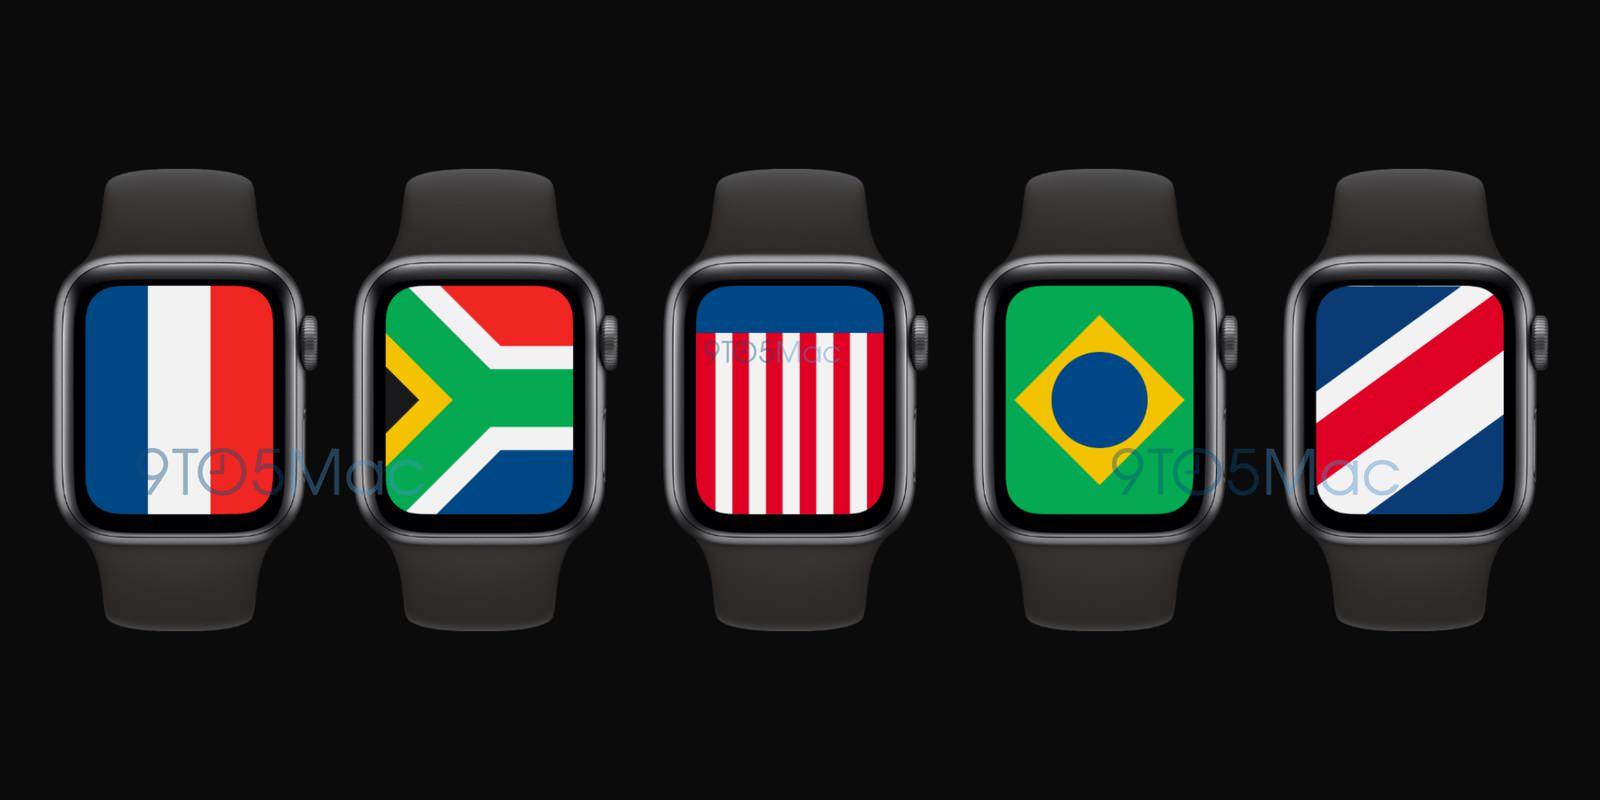 watchOS-7-International-watch-face.jpg